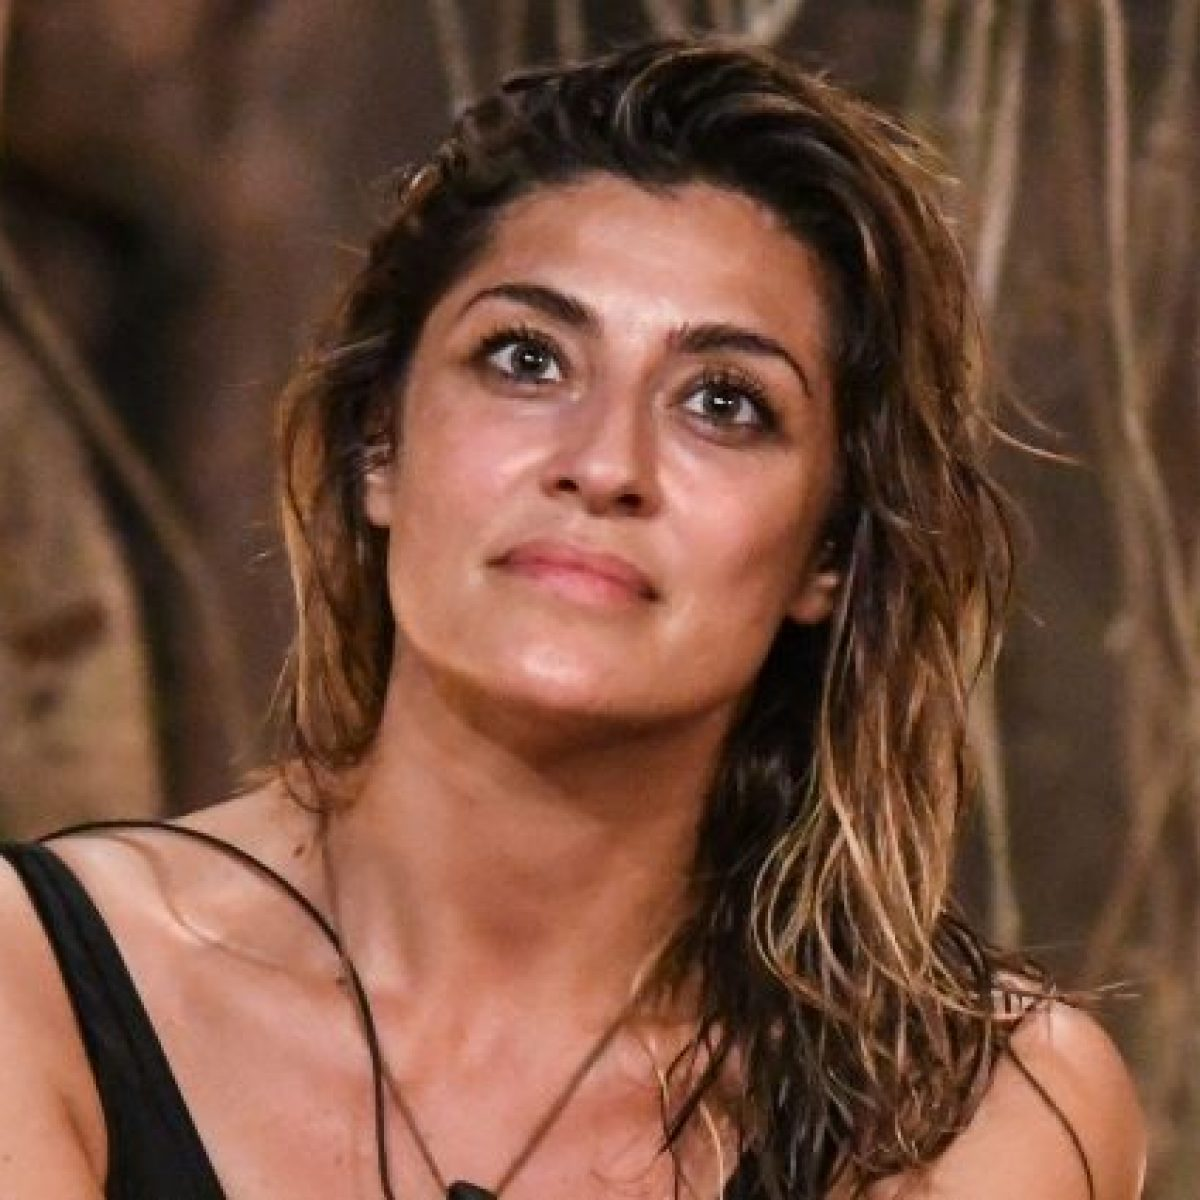 Elisa Isoardi Intervista Nessun Programma Nessun Amore